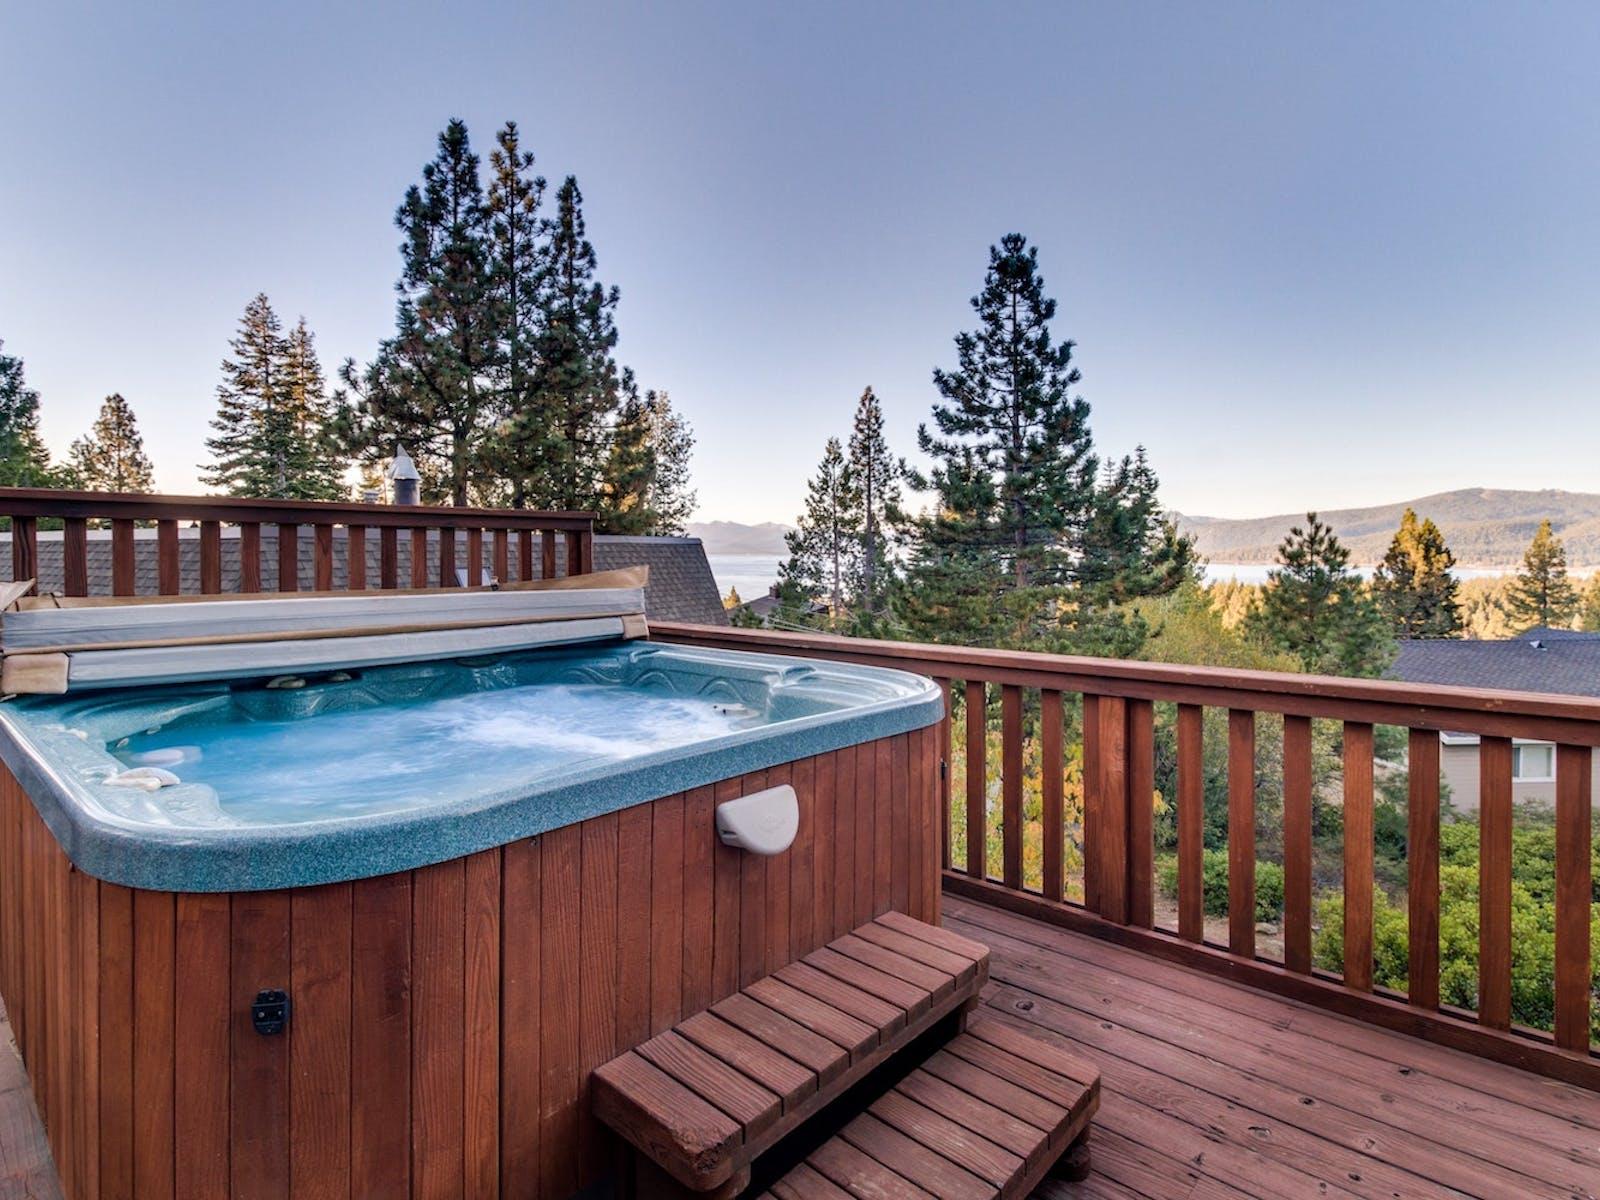 Vacation rental in Lake Tahoe with hot tub and lake views